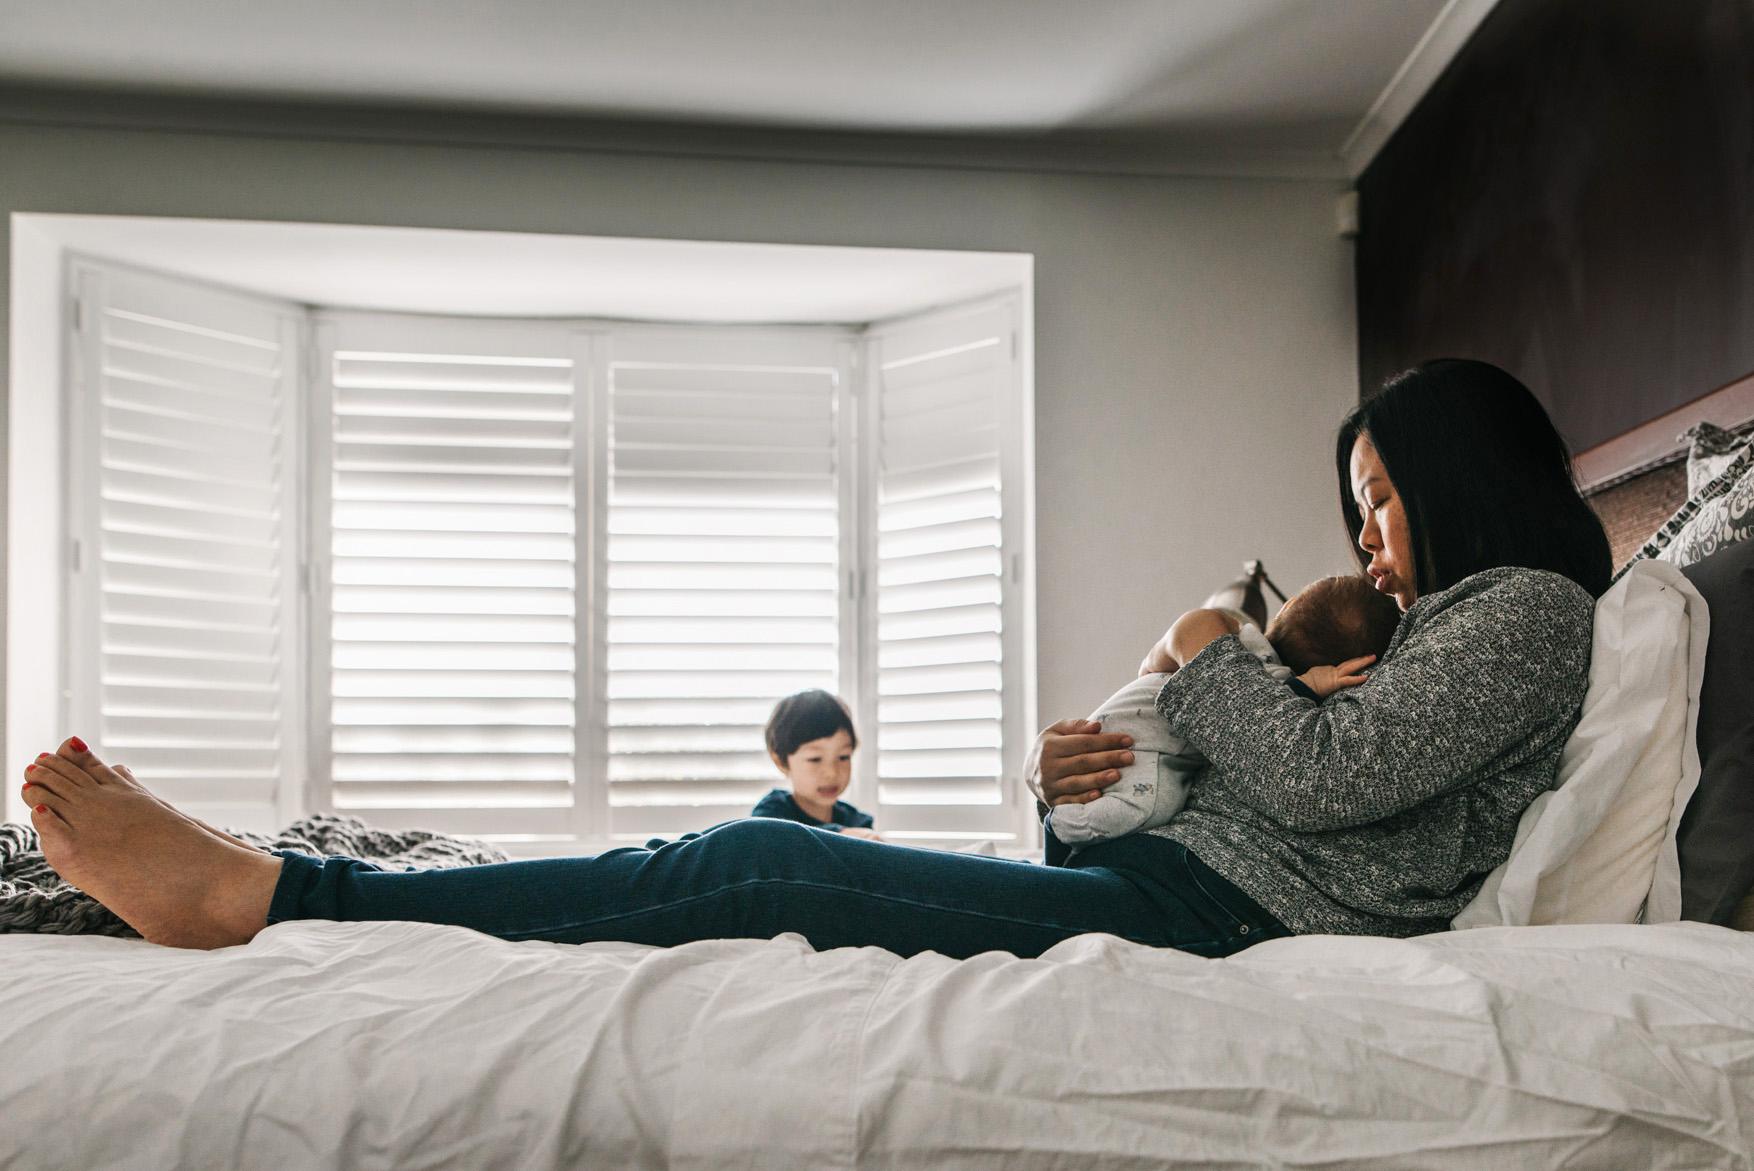 In home baby photos | Cindy Cavanagh